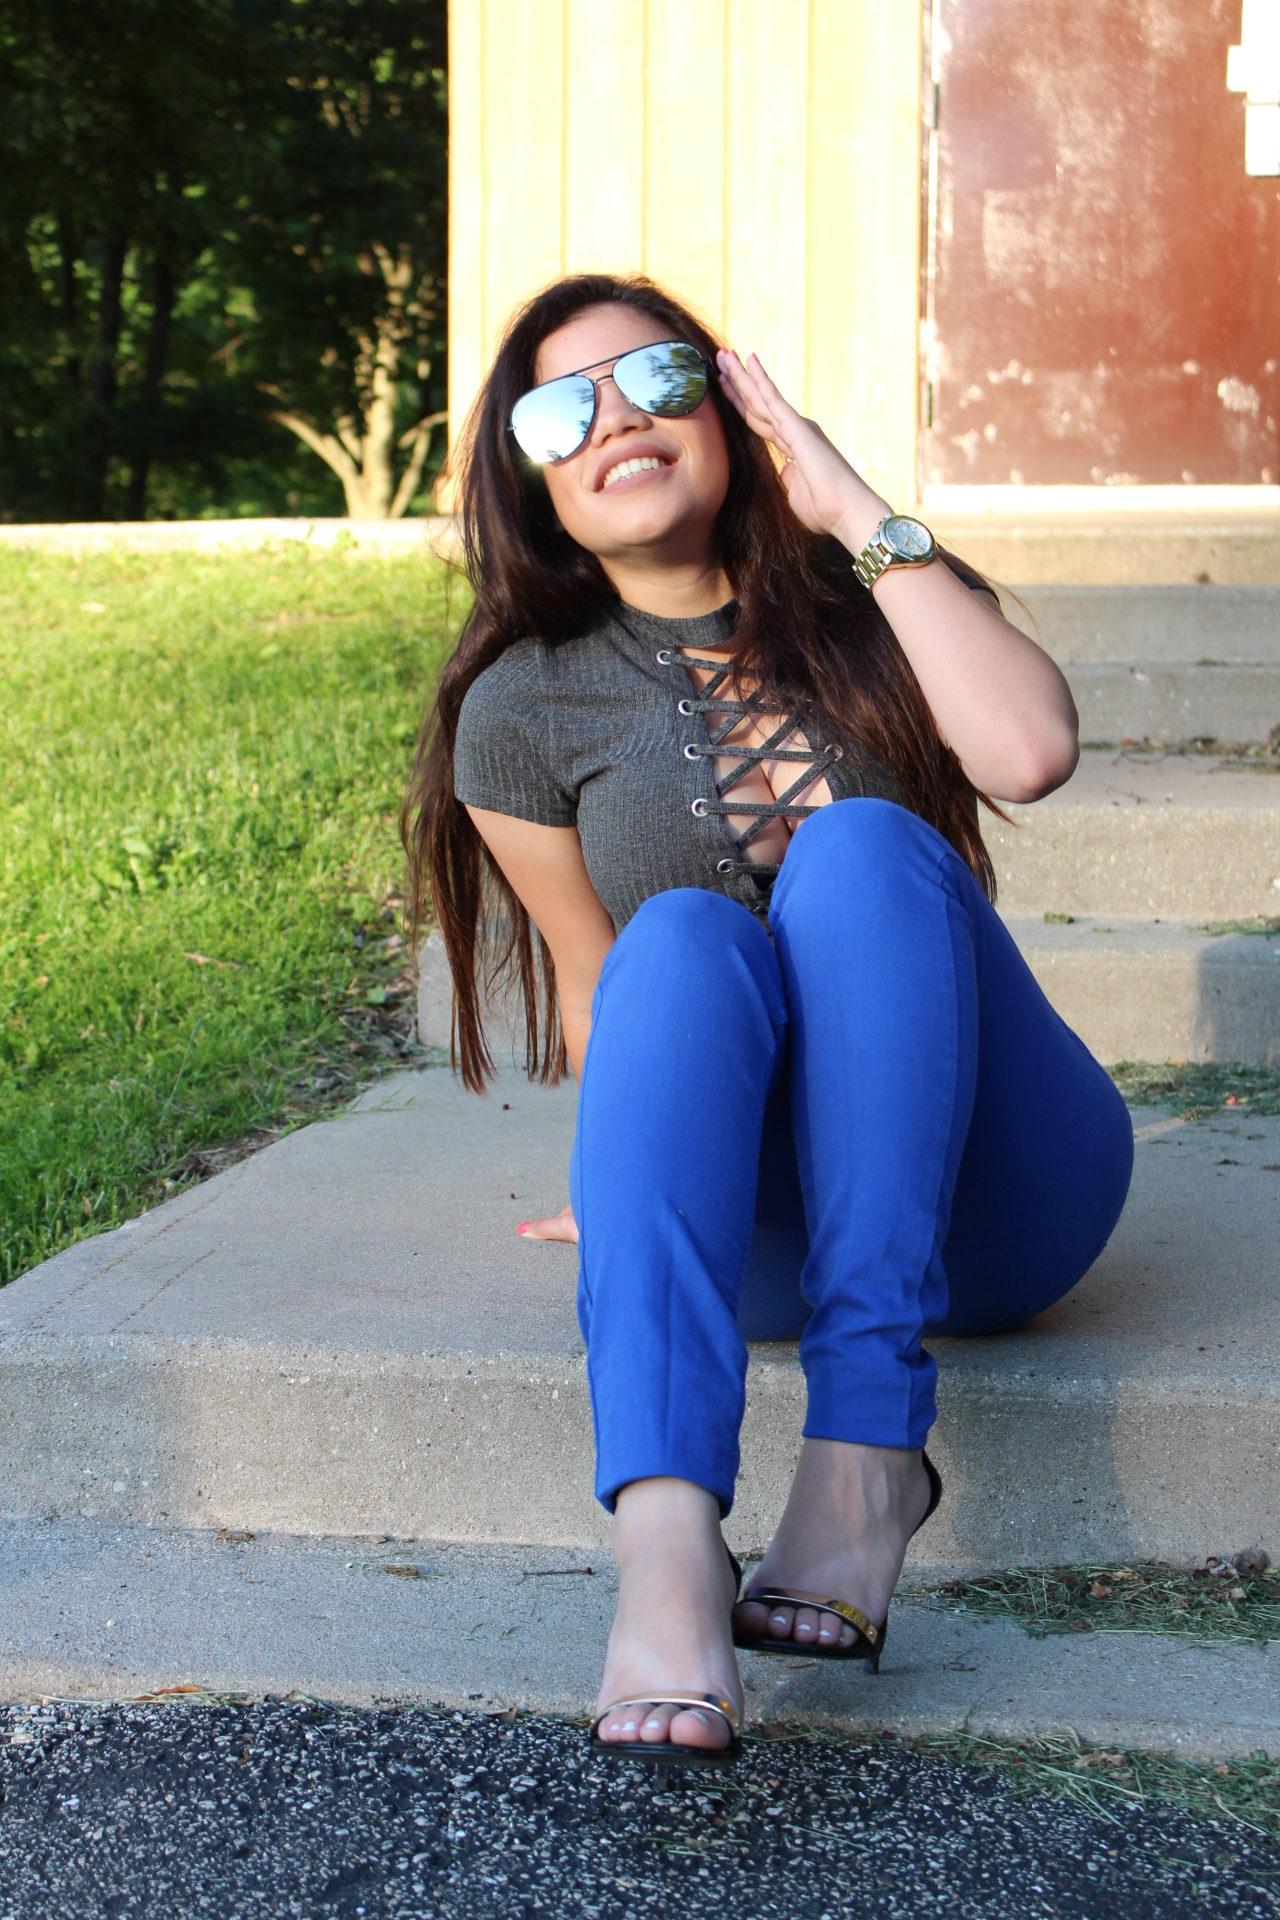 Tobi gray bodysuit OOTD OOTN outfit ideas tobi online store casual outfit by Alejandra Avila - Tufashionpetite